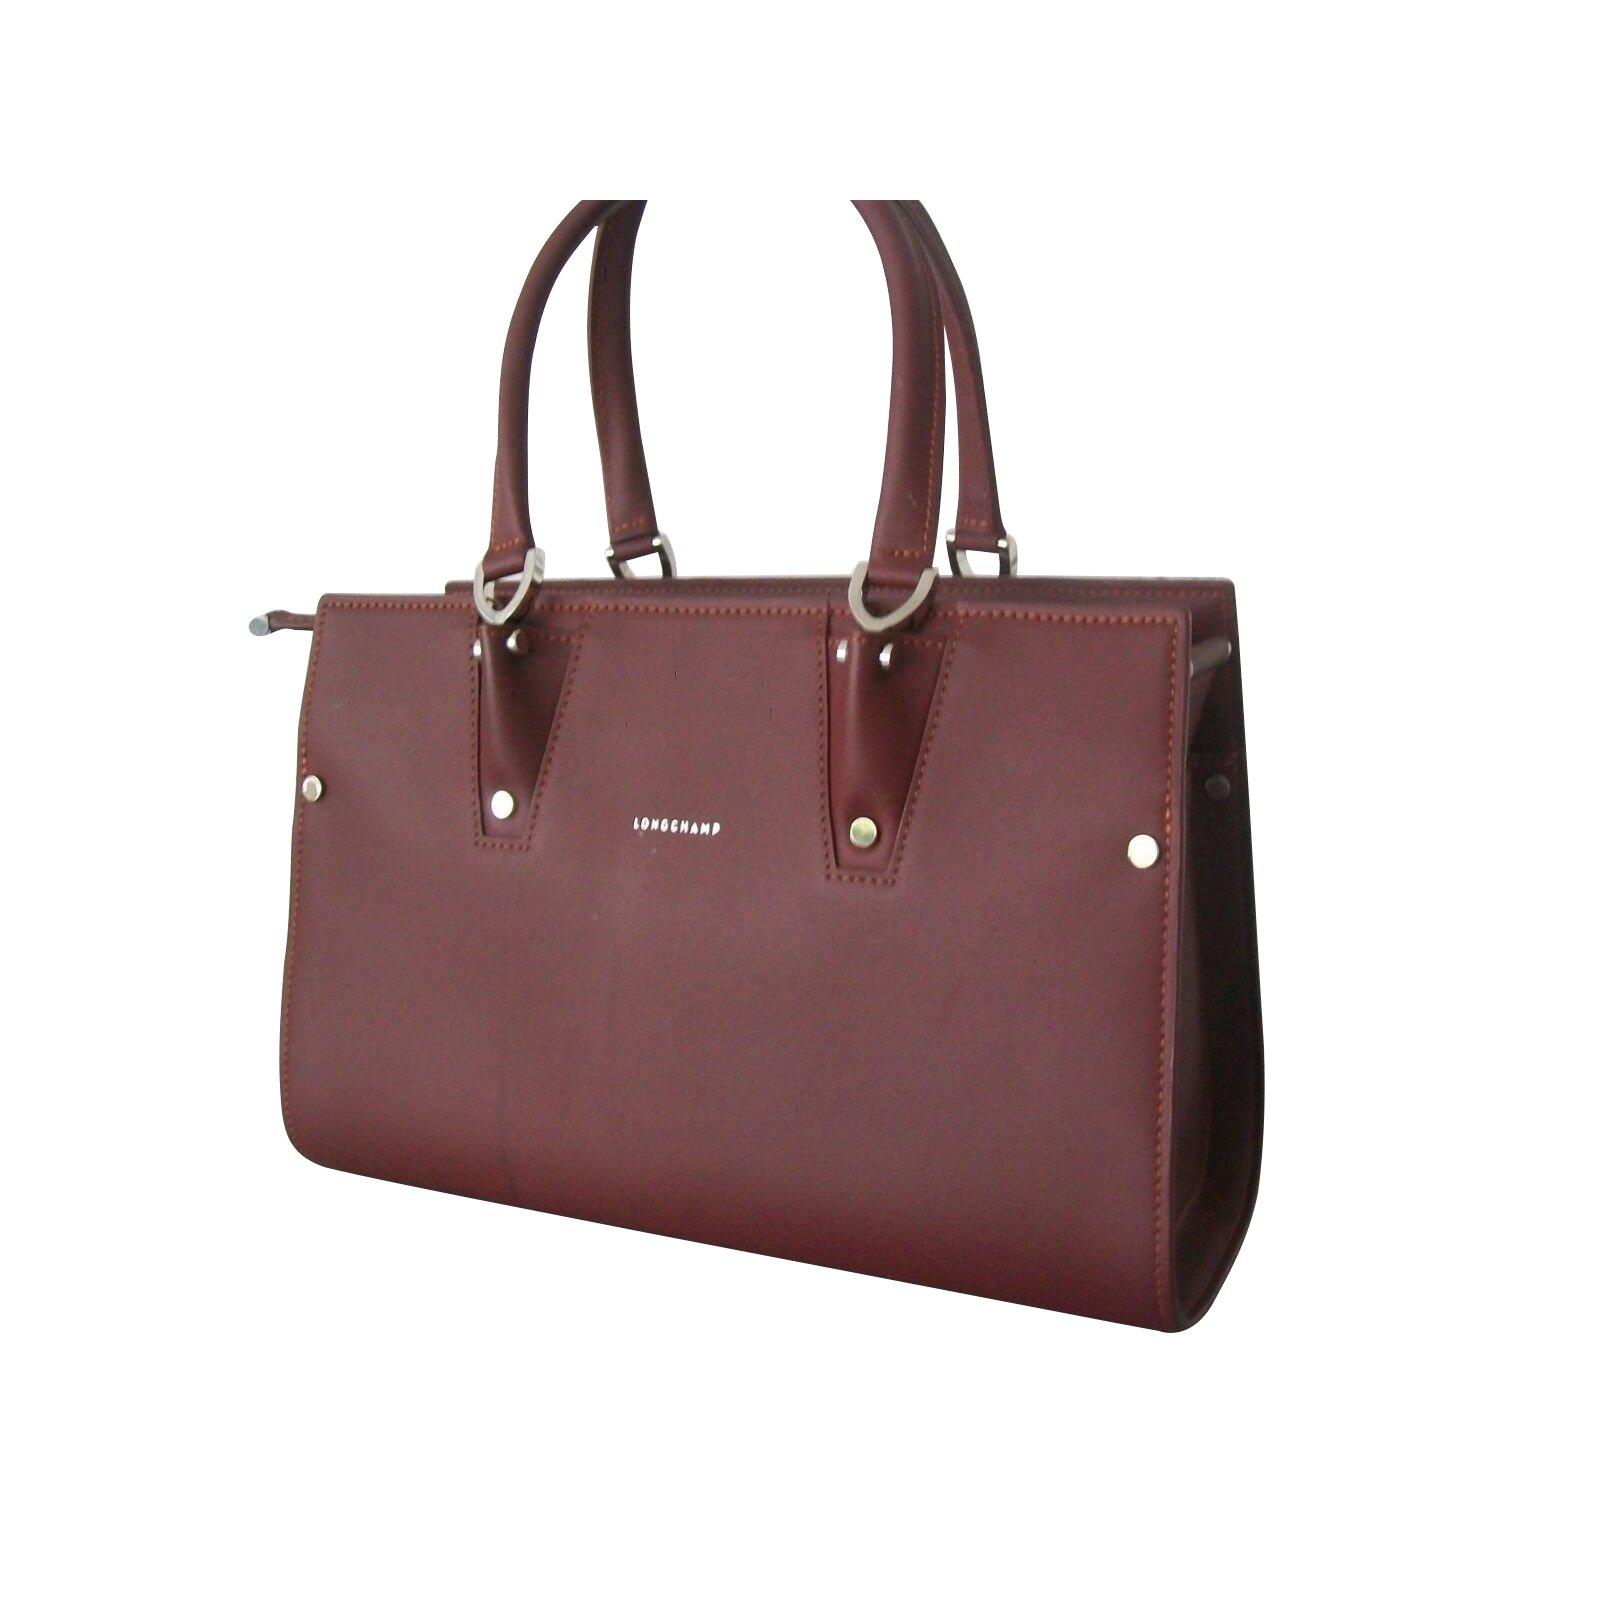 756bd87cc5 Longchamp Handbag PARIS PREMIERE longchamp Size S Handbags Leather Dark red  ref.109291